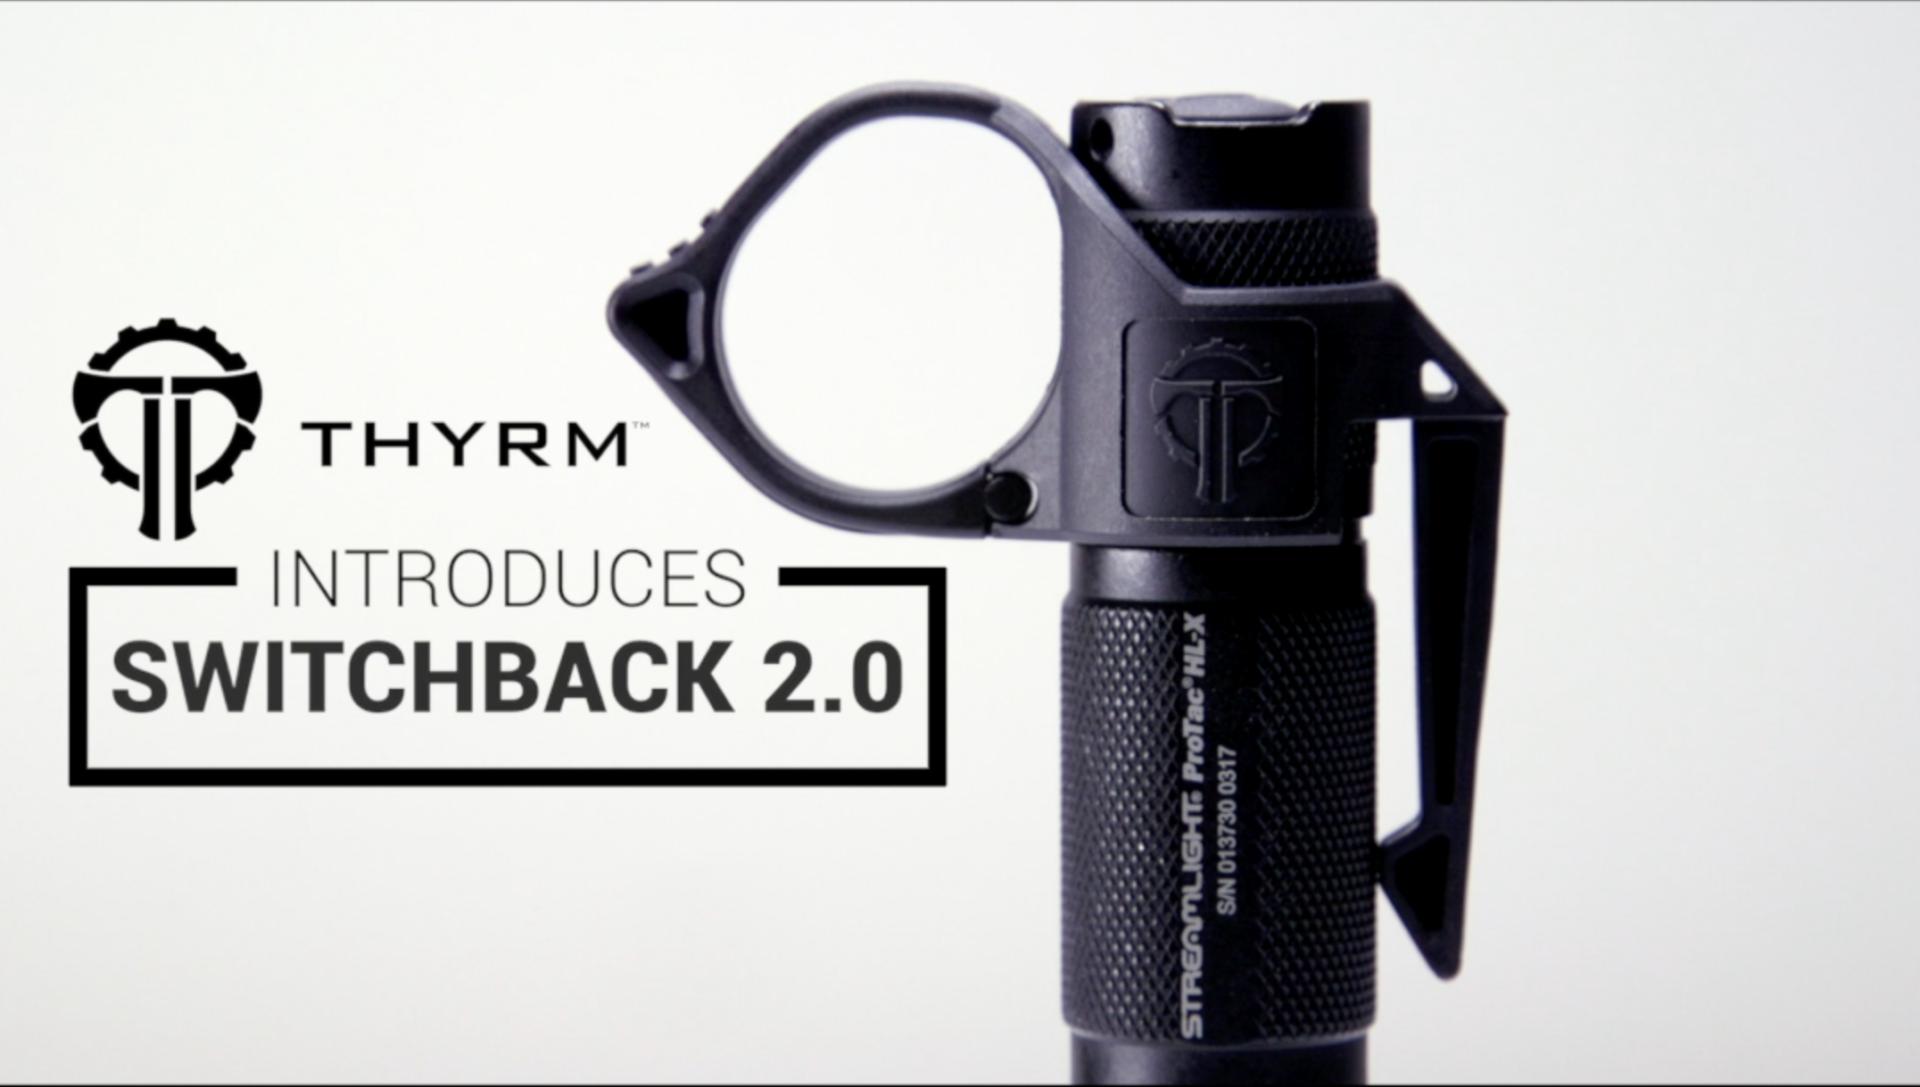 Thyrm Switchback 2.0